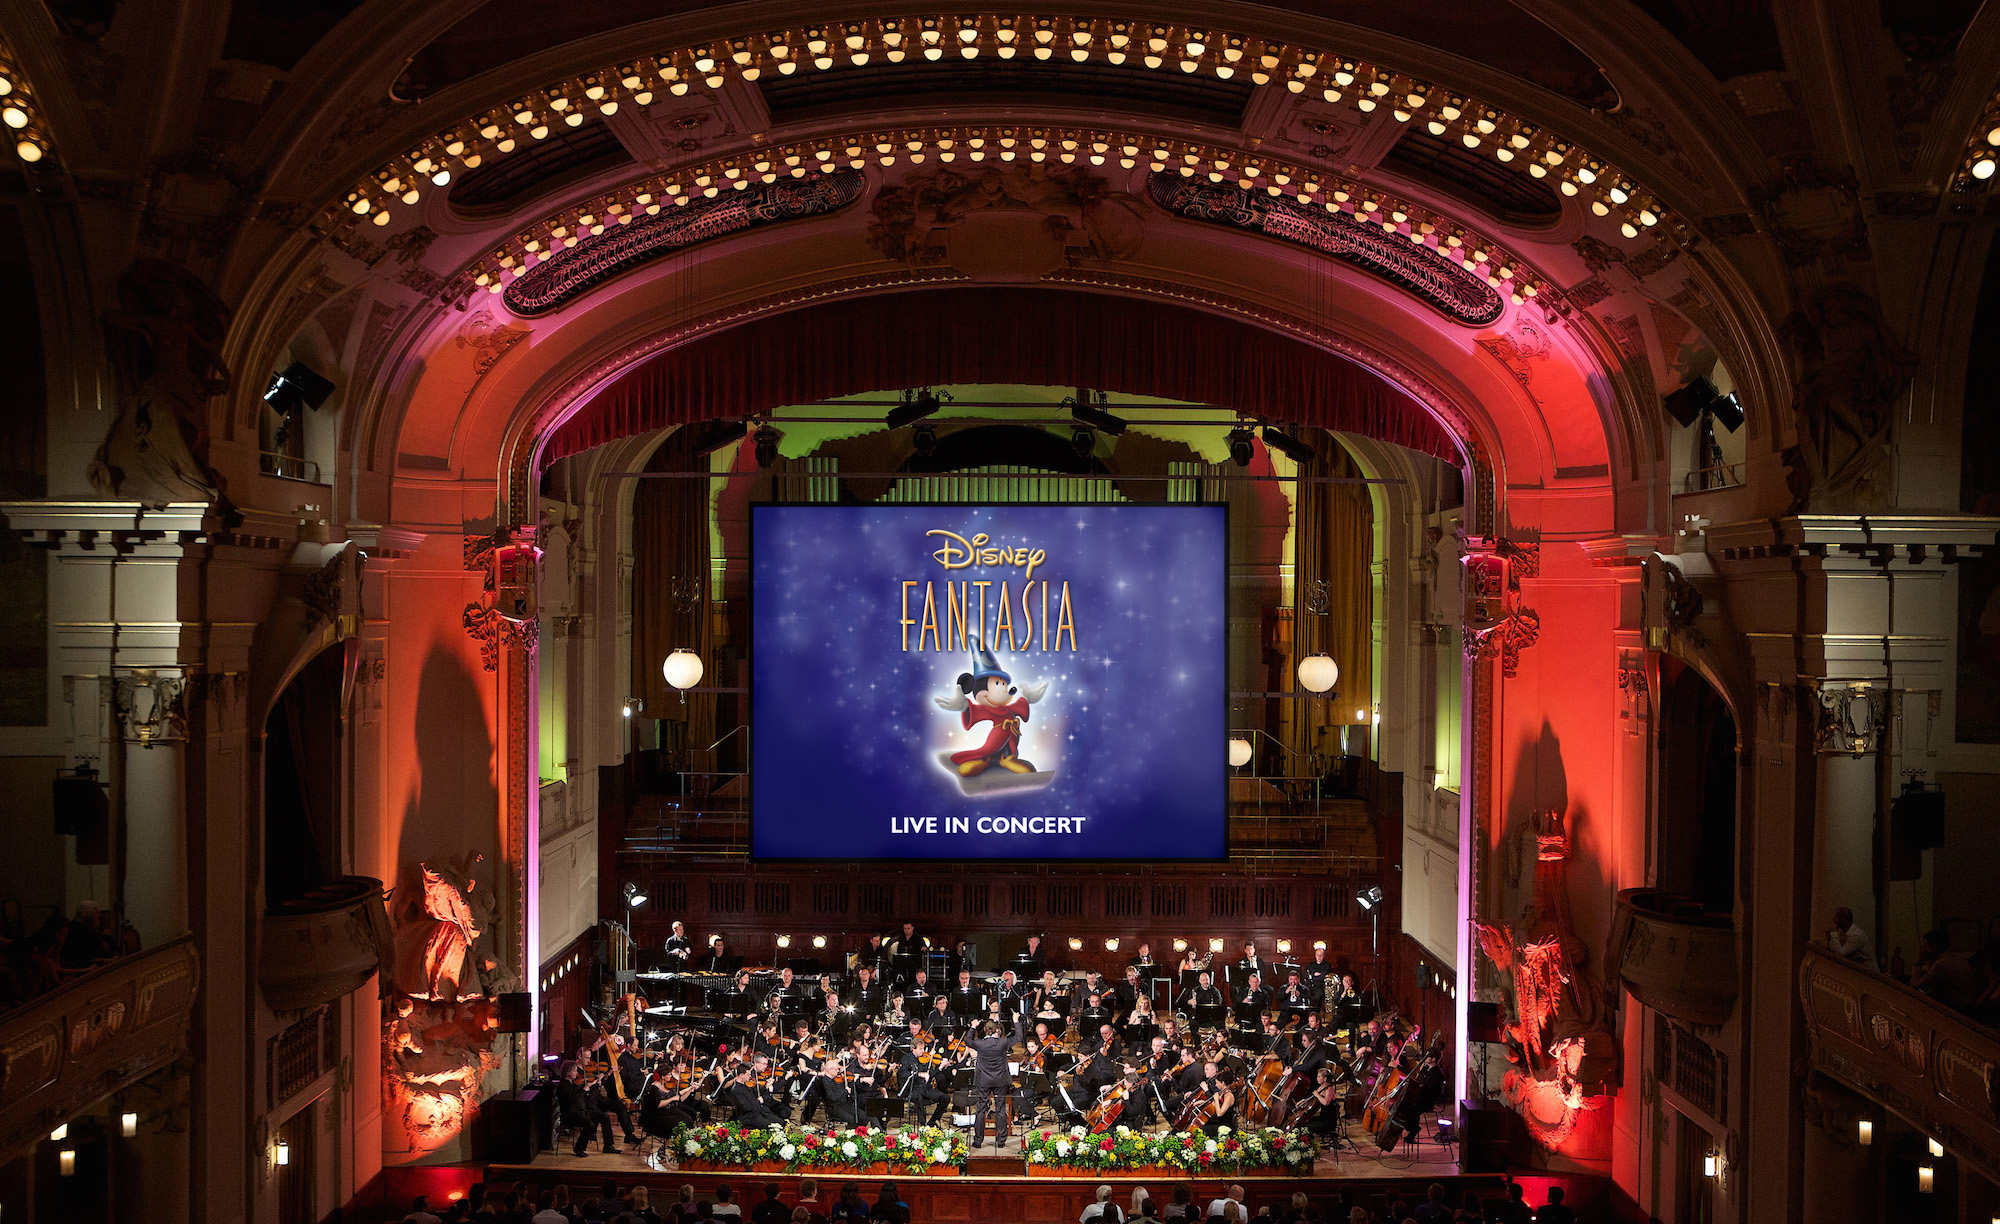 Live orchestra version of Disney's 'Fantasia' (credit: CAMI)